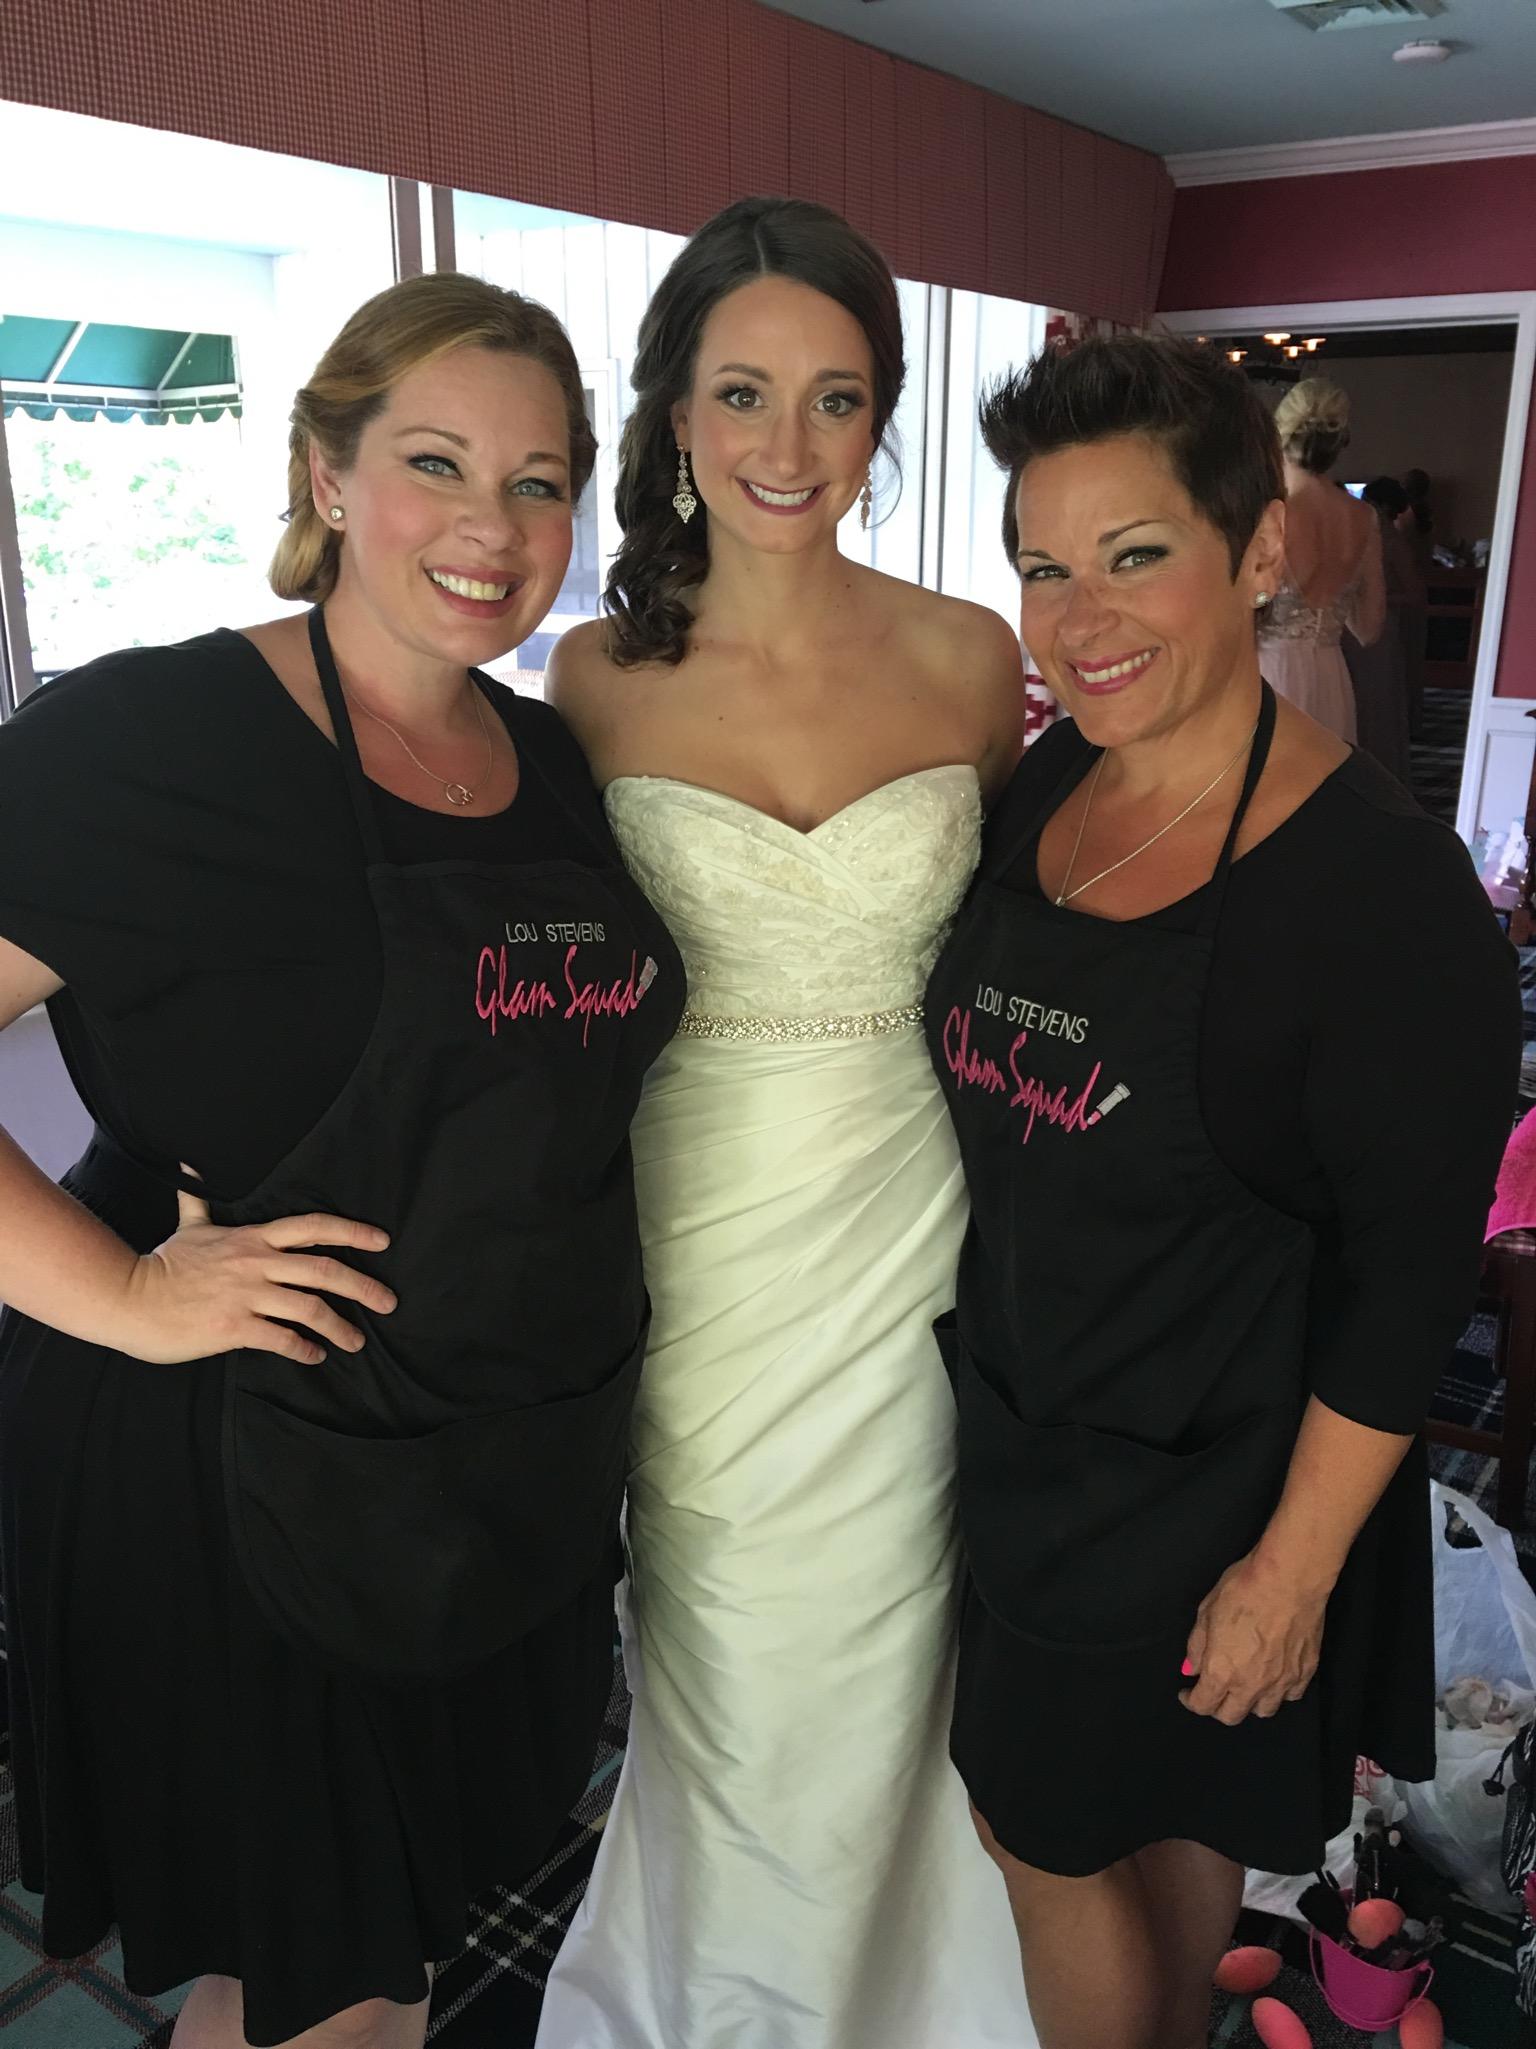 Glam Squad and bride sandwich!